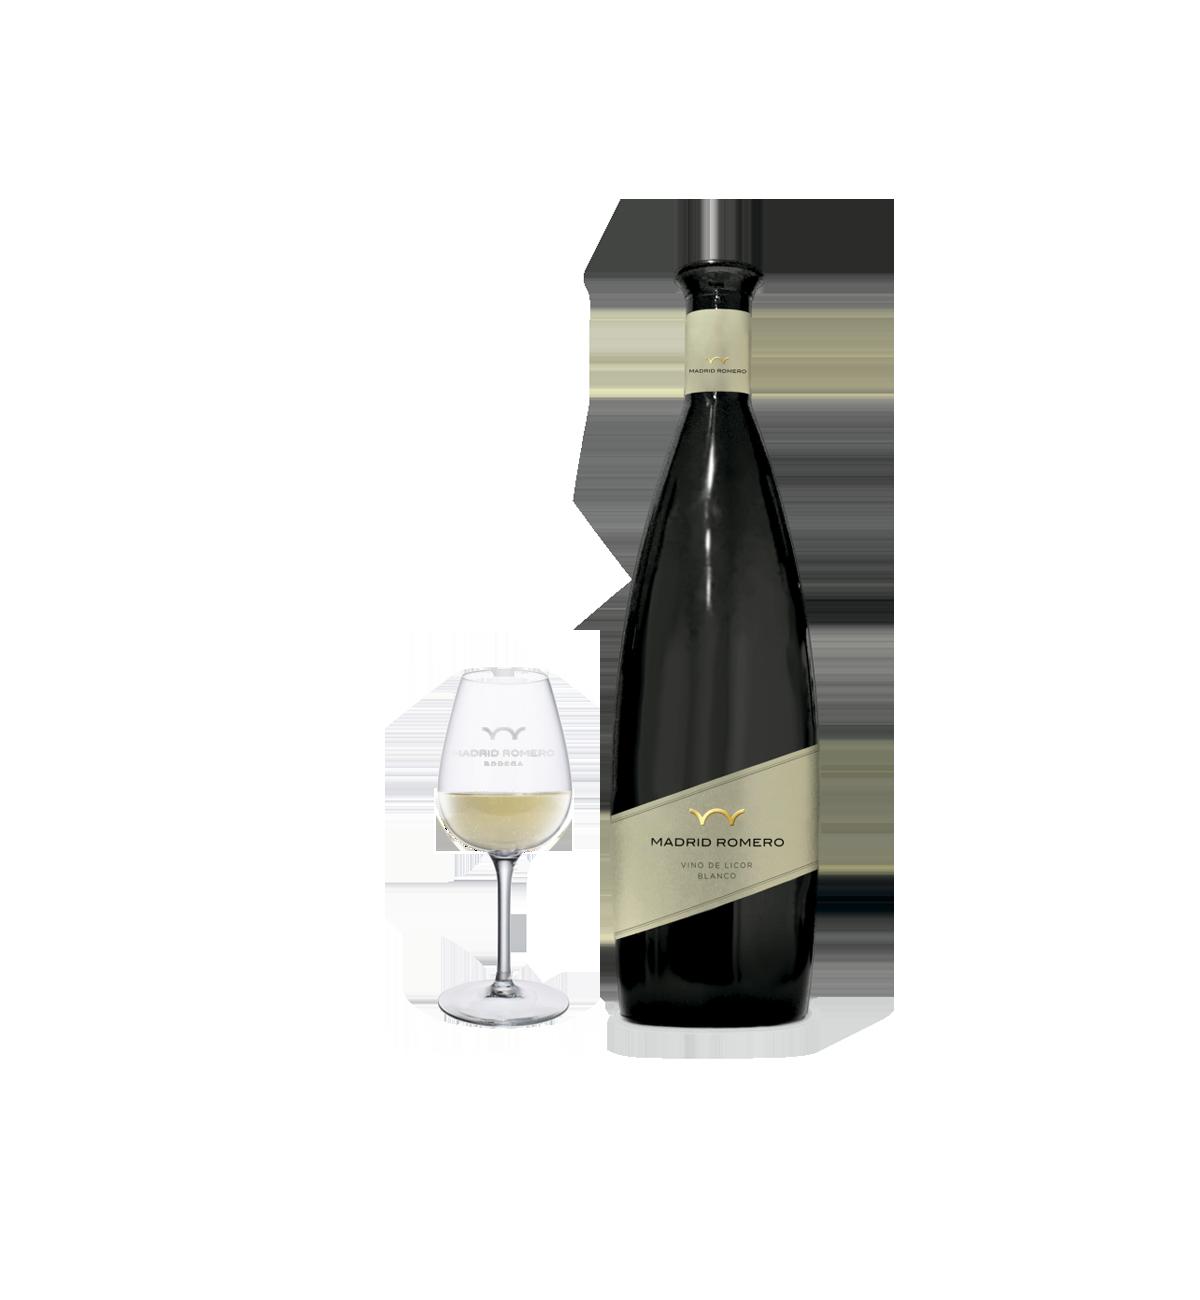 Vino Dulce Blanco Madrid Romero * Moscatel, Vino de Licor,  Jumilla